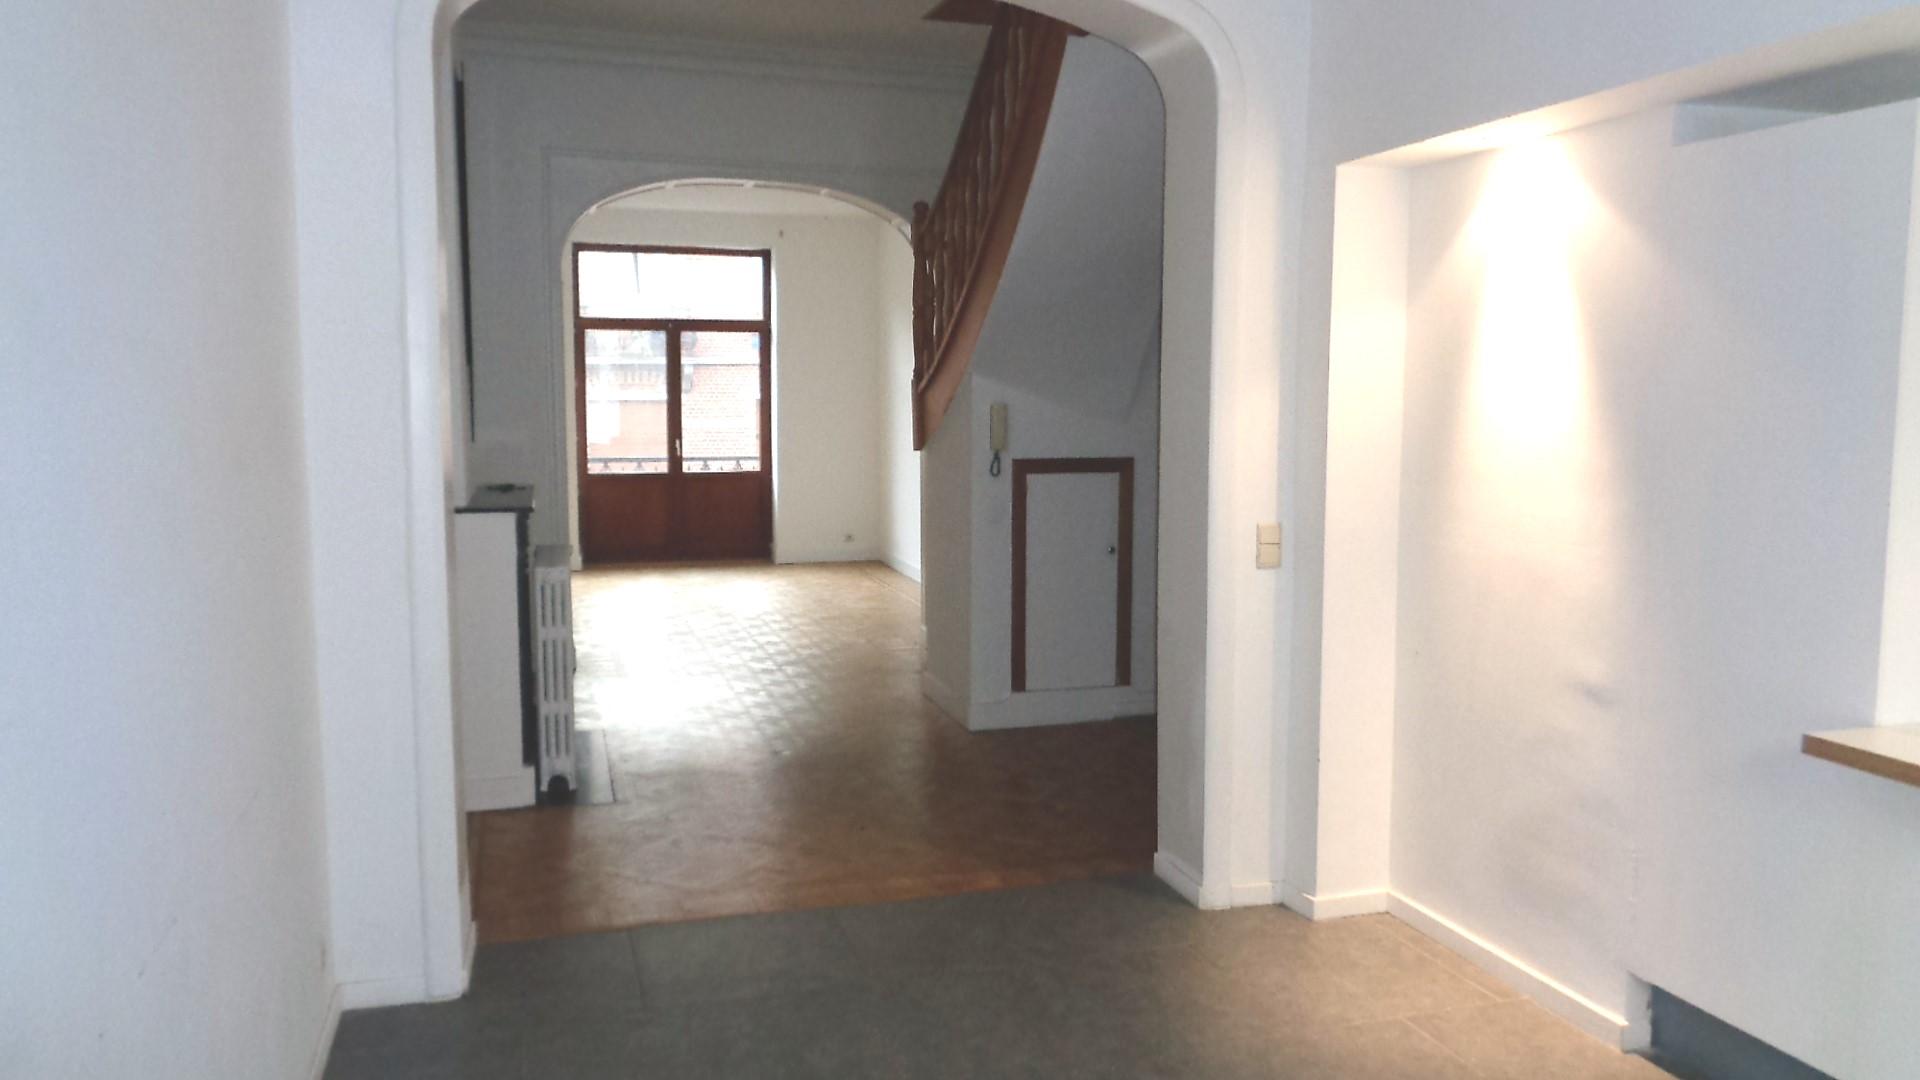 Appartement duplex 3 chambres avec jardin